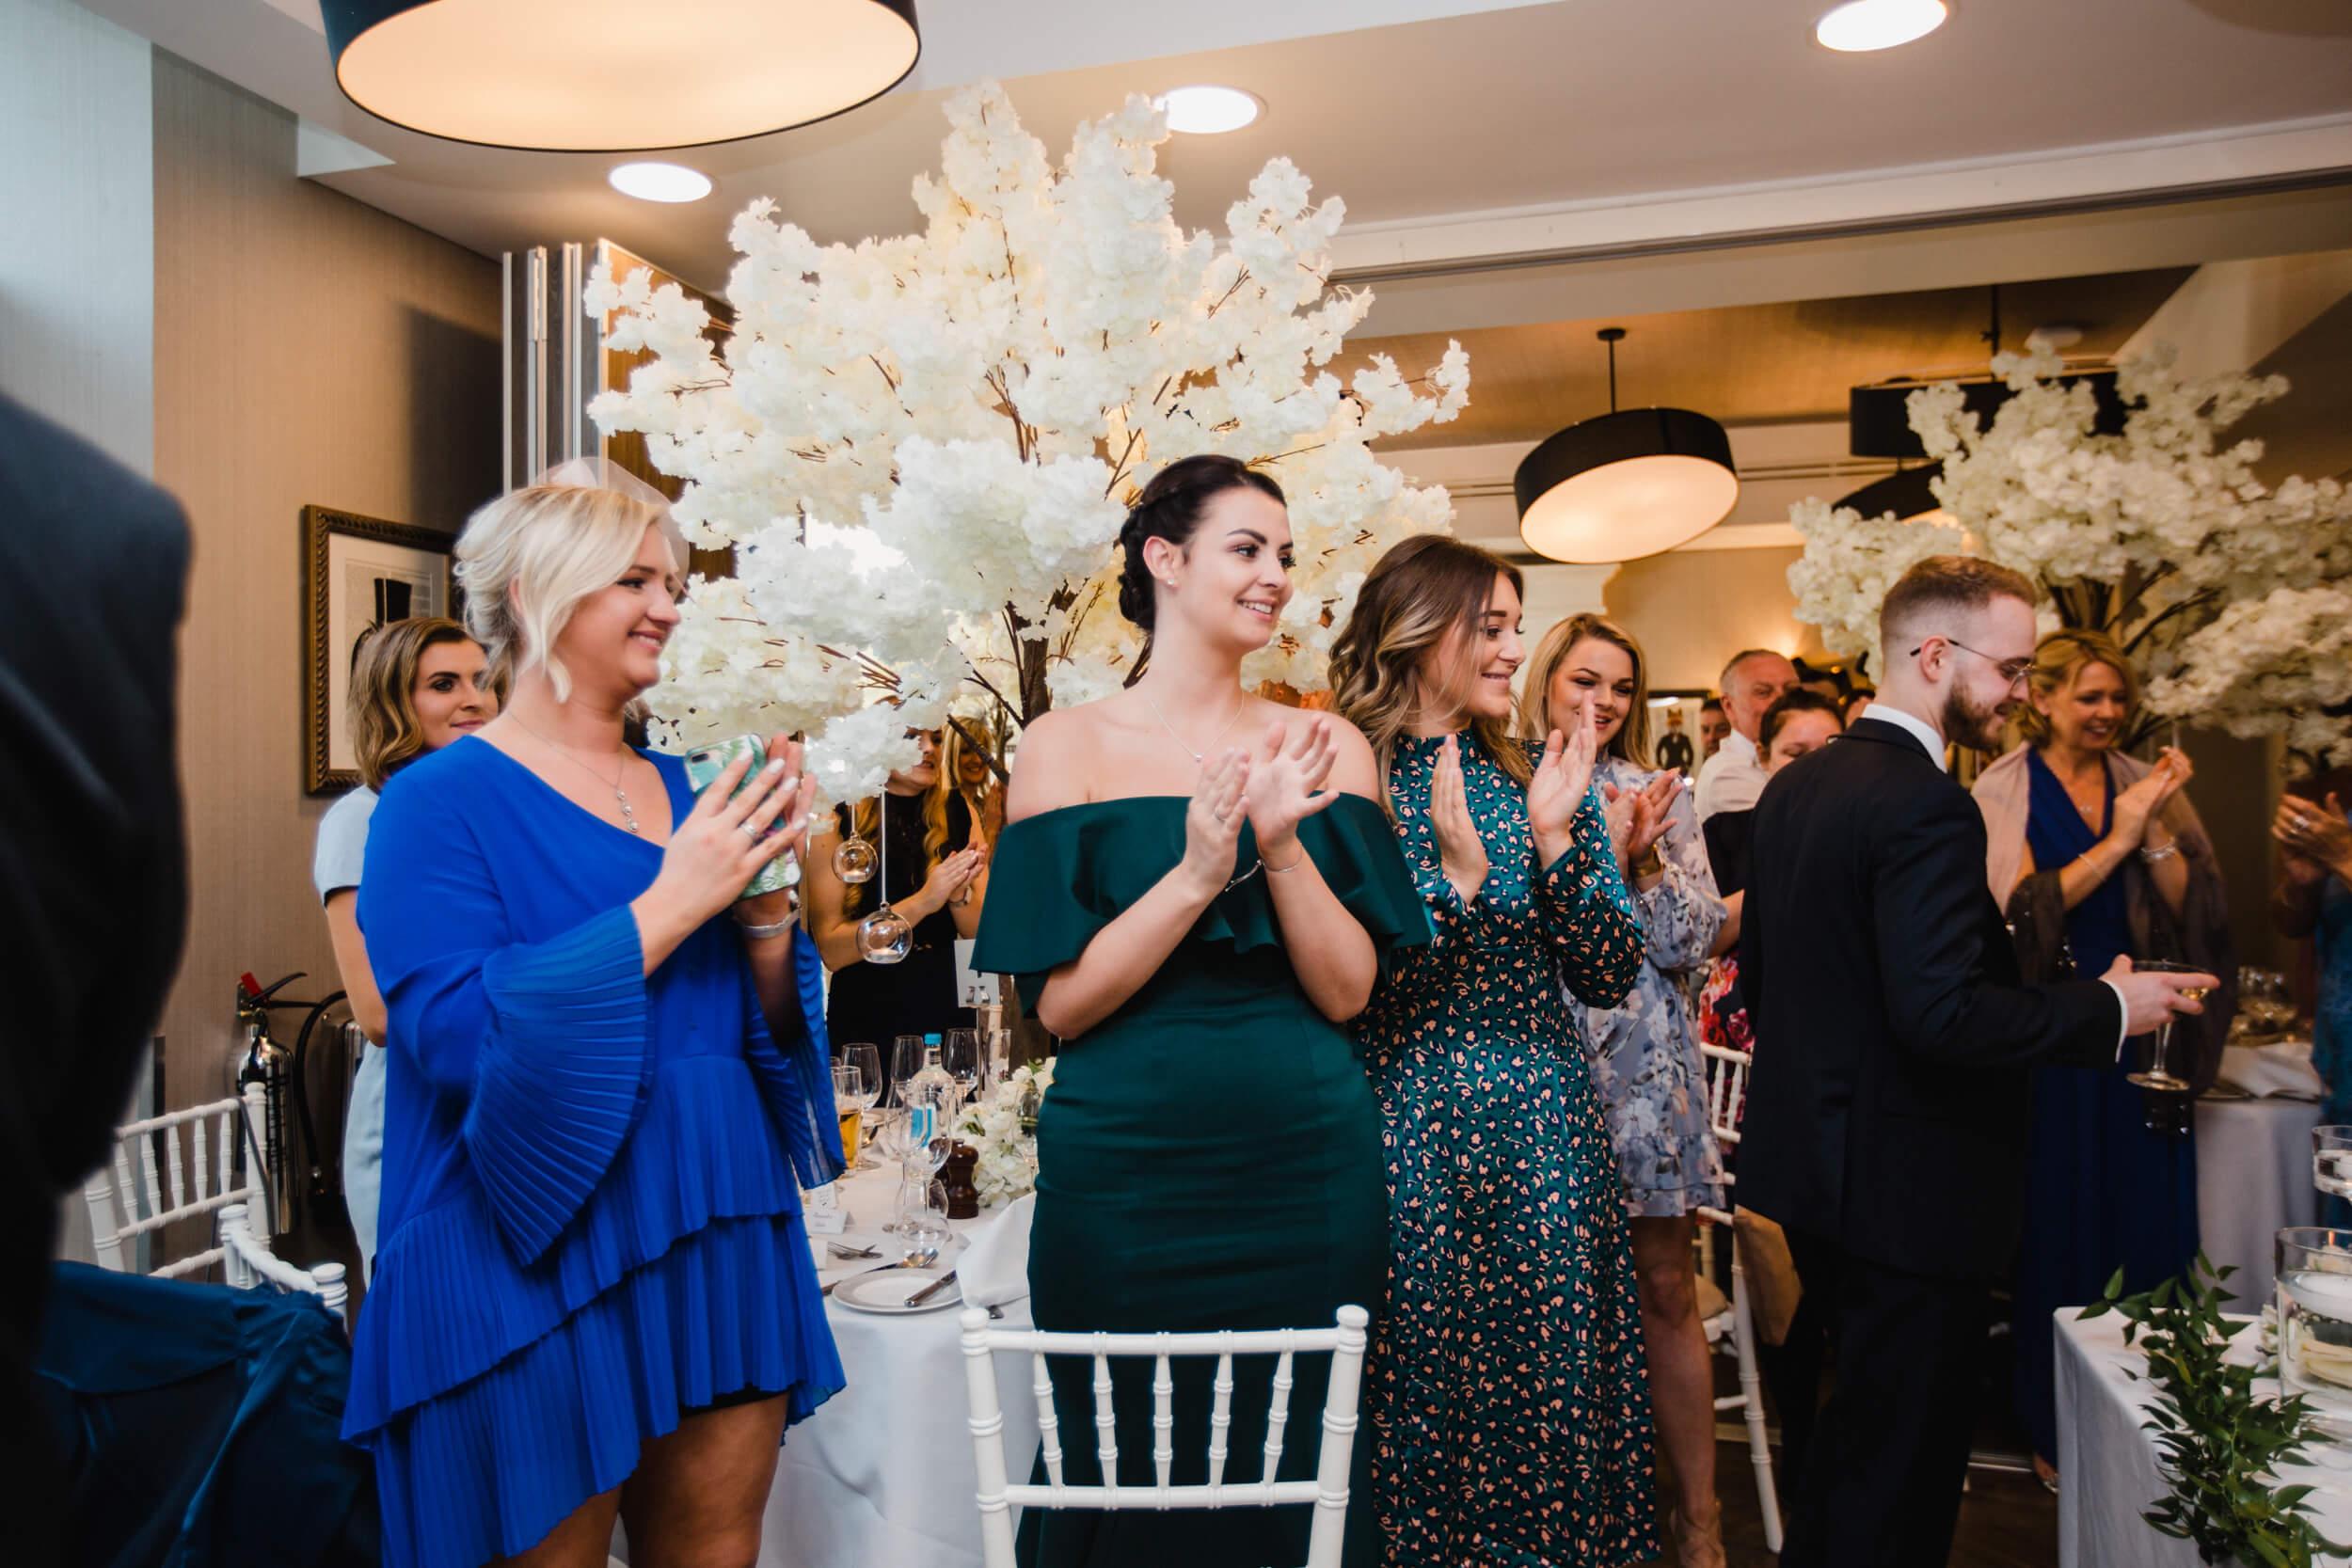 wedding guests and bridesmaids cheering entrance of newlyweds